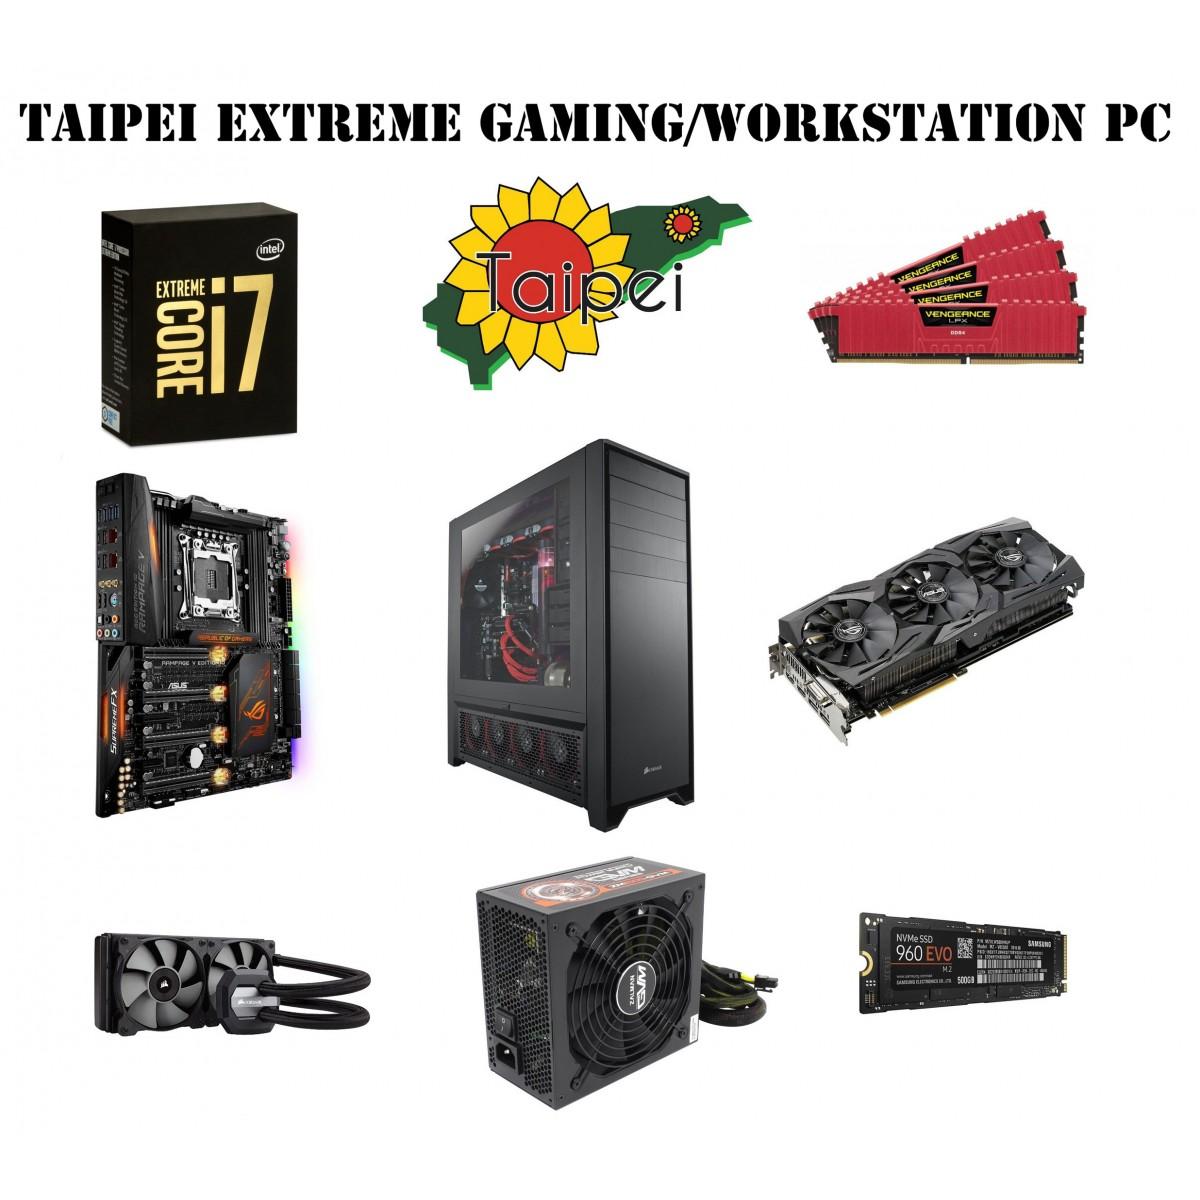 Taipei Extreme Gaming / Workstation PC